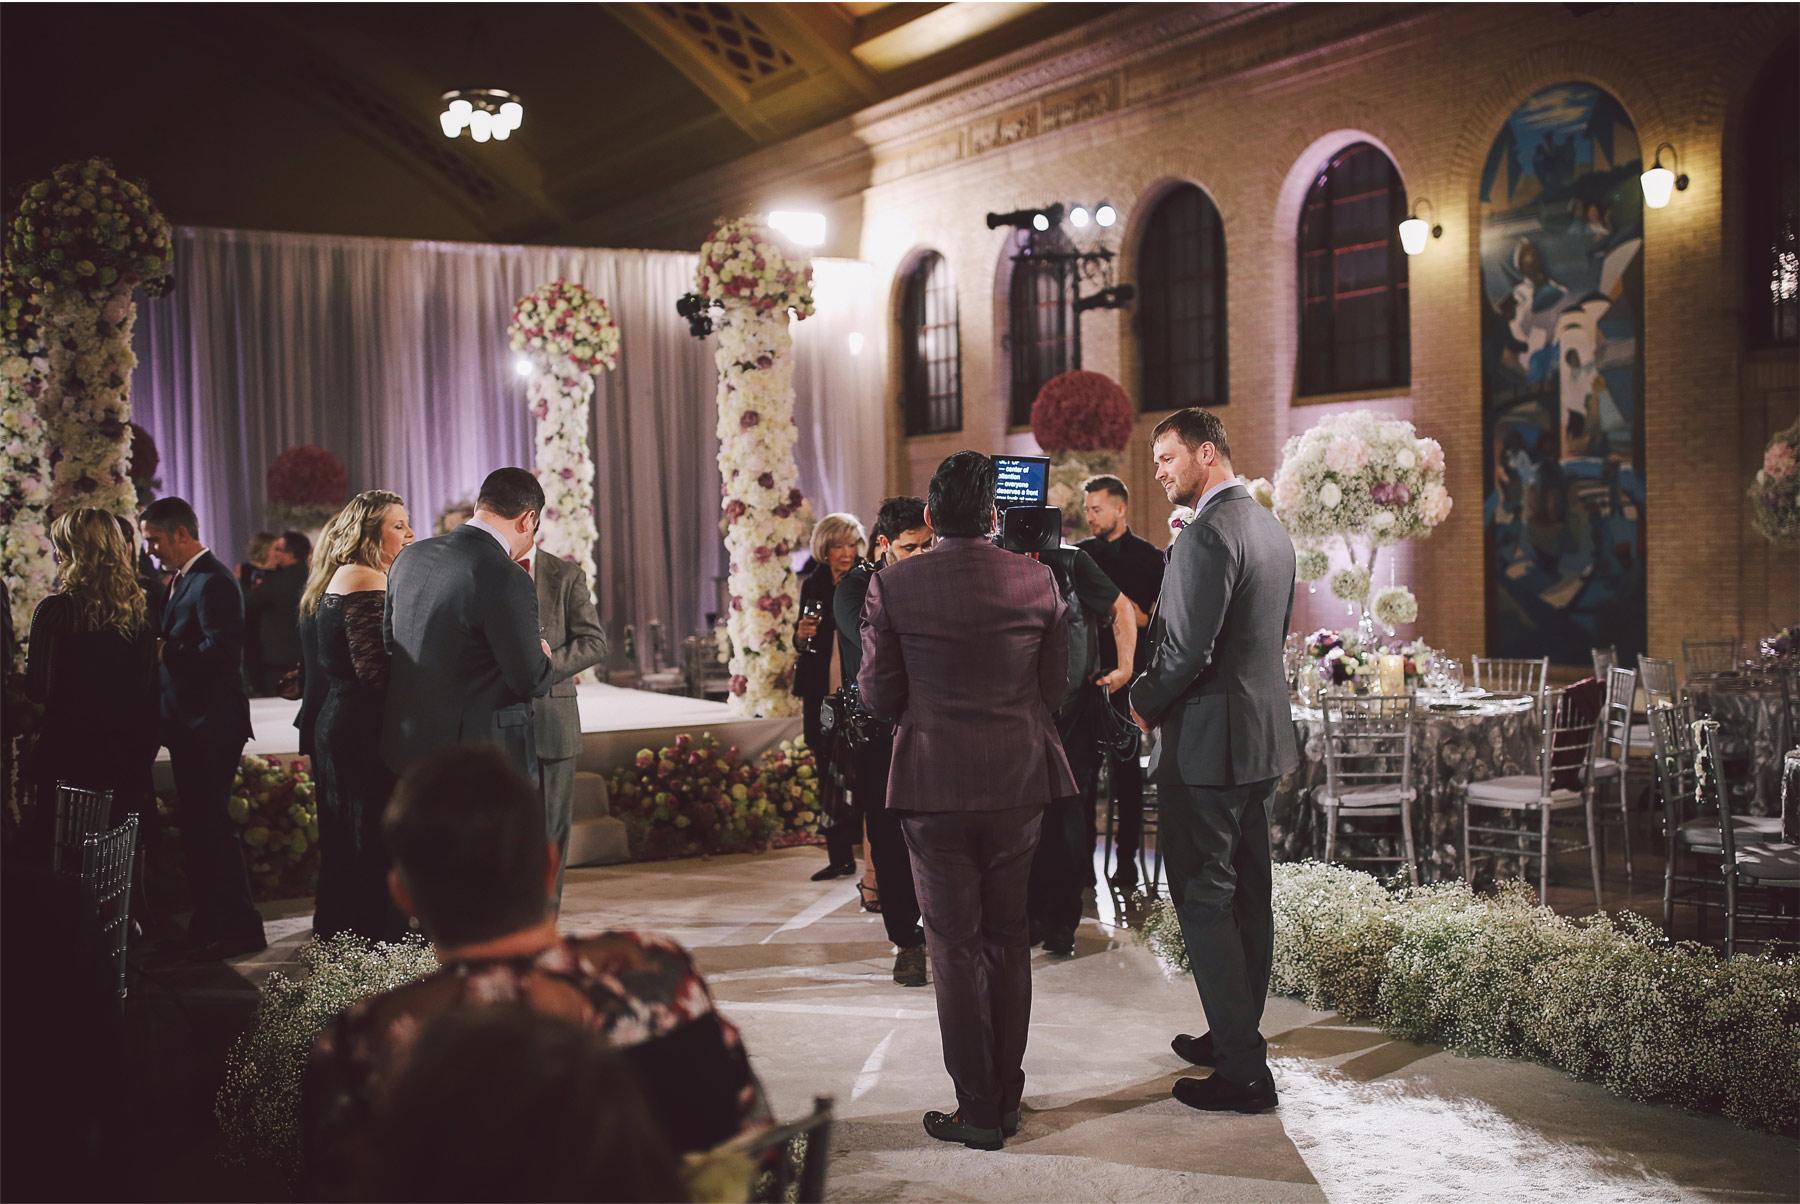 13-Andrew-Vick-Photography-My-Great-Big-Live-Wedding-with-David-Tutera-Behind-the-Scenes-Minnesota-Union-Depot-Saint-Paul-tv-crew.jpg